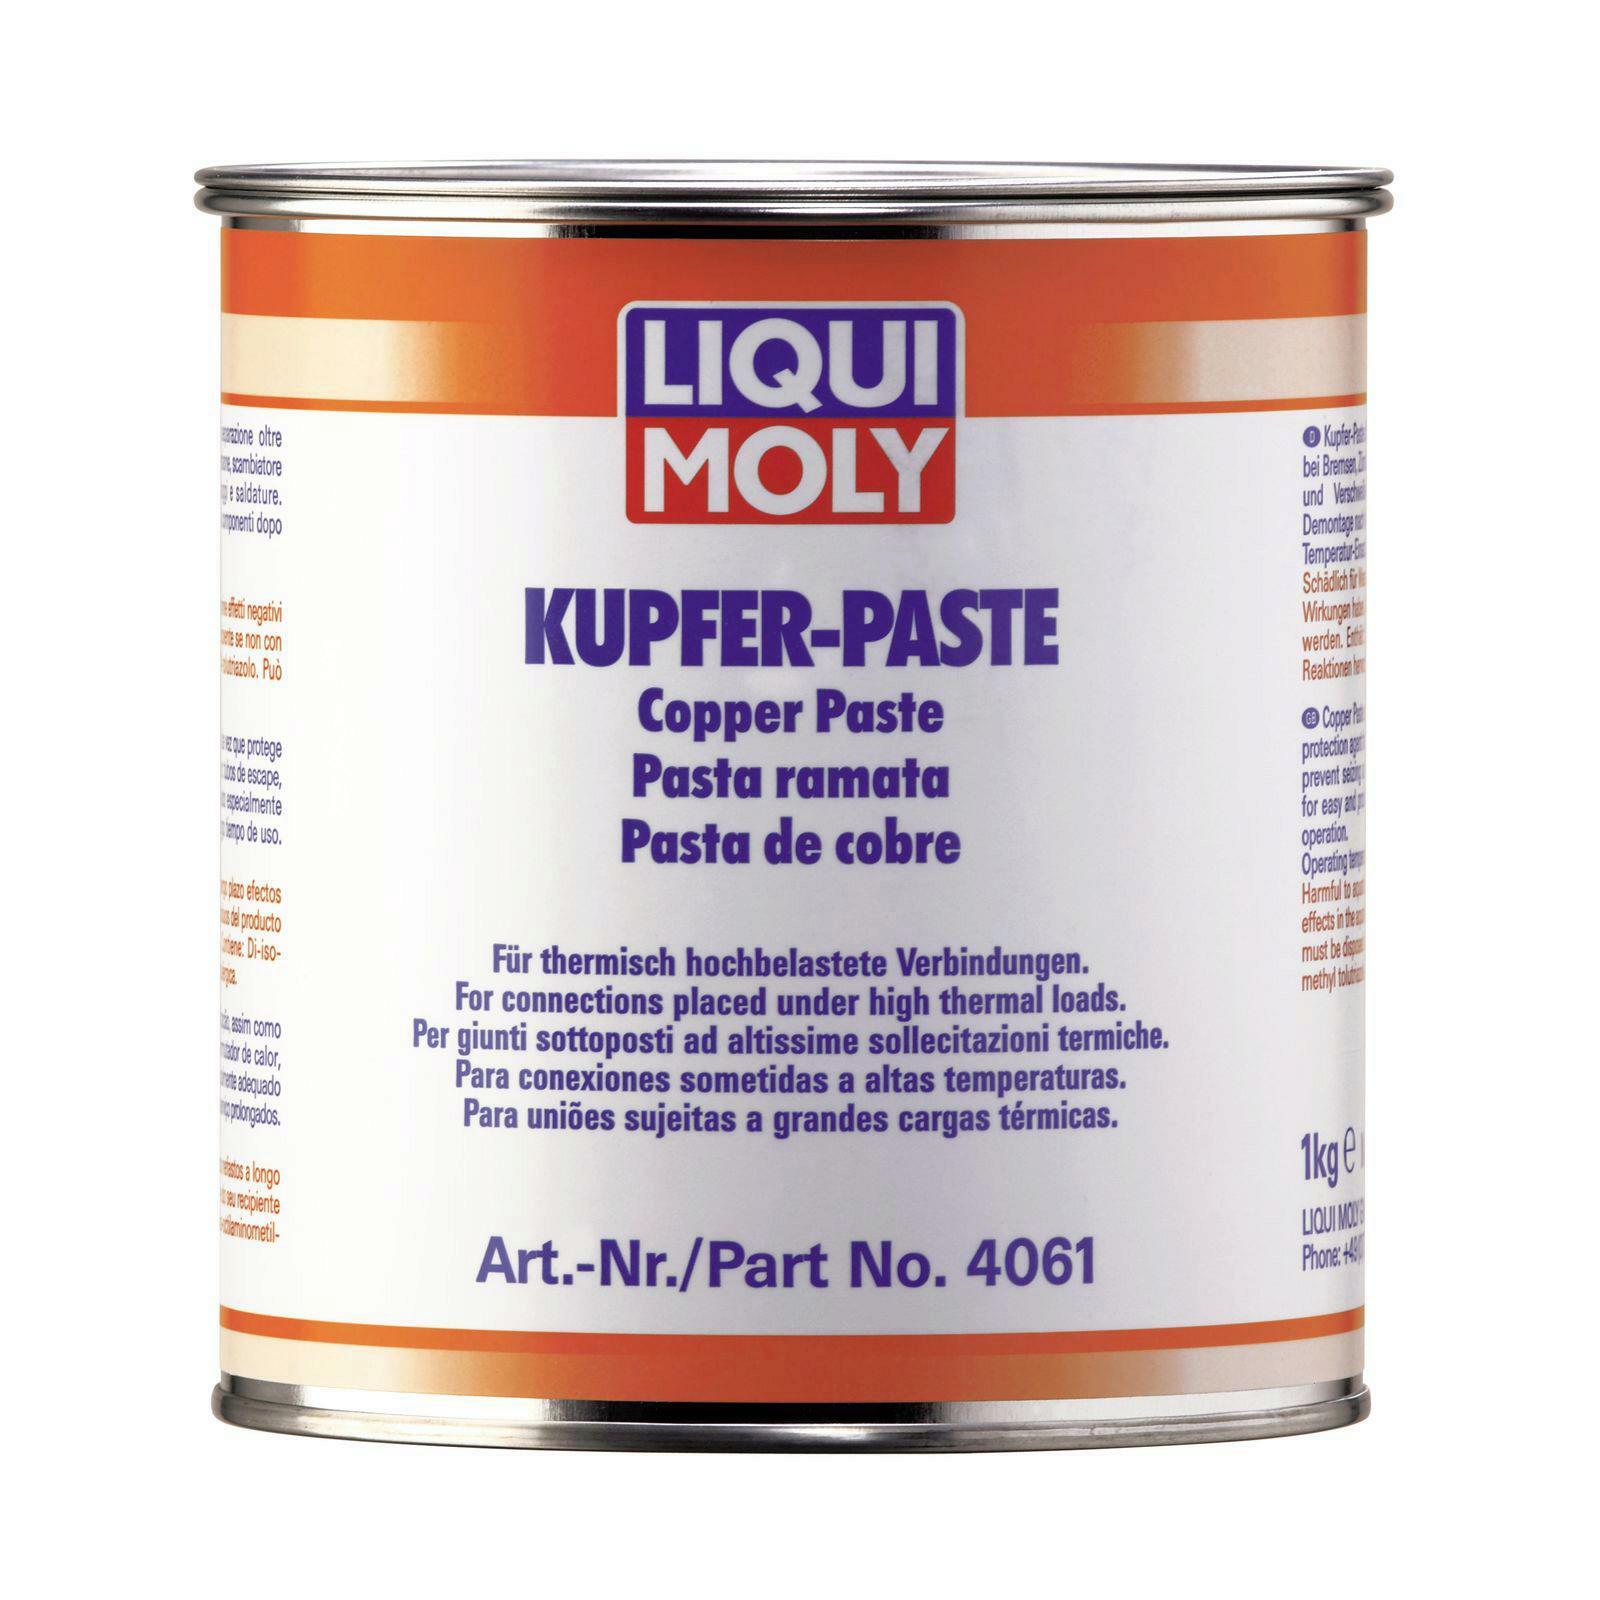 Liqui Moly Kupfer-Paste 1kg